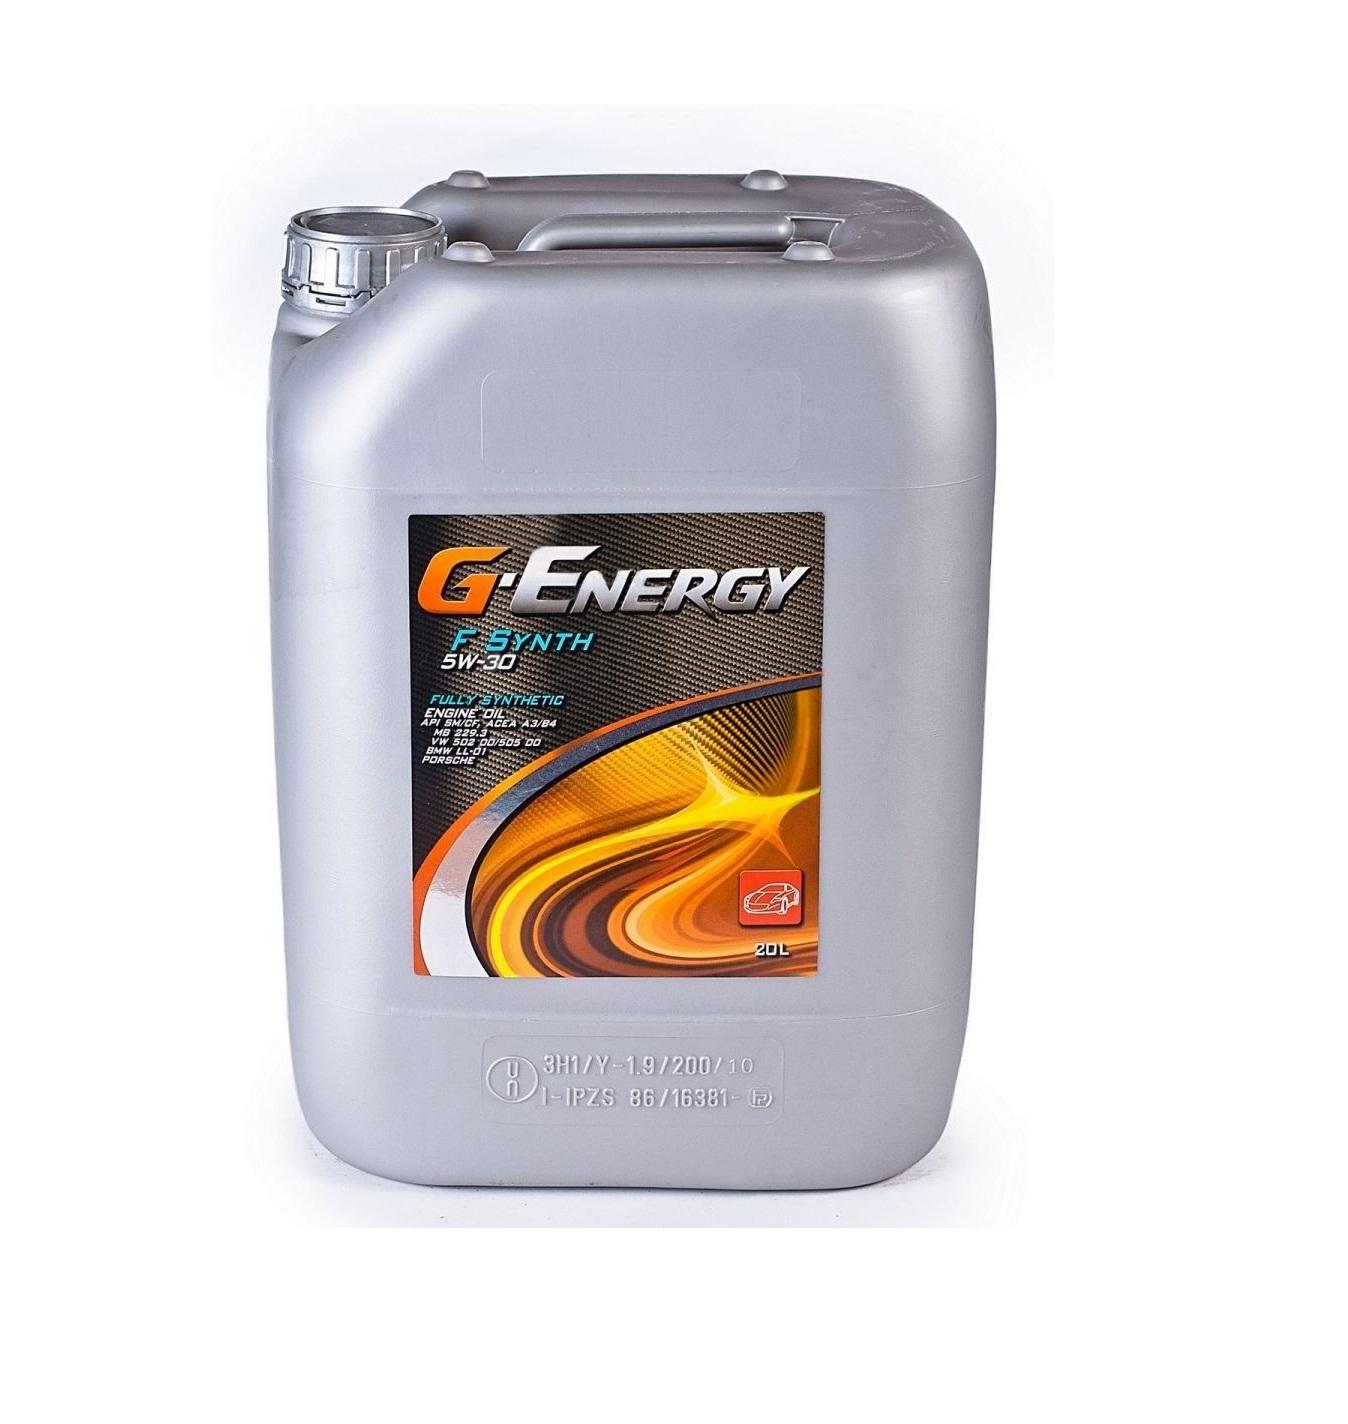 G-Energy F Synth 5W-30 (20 л)